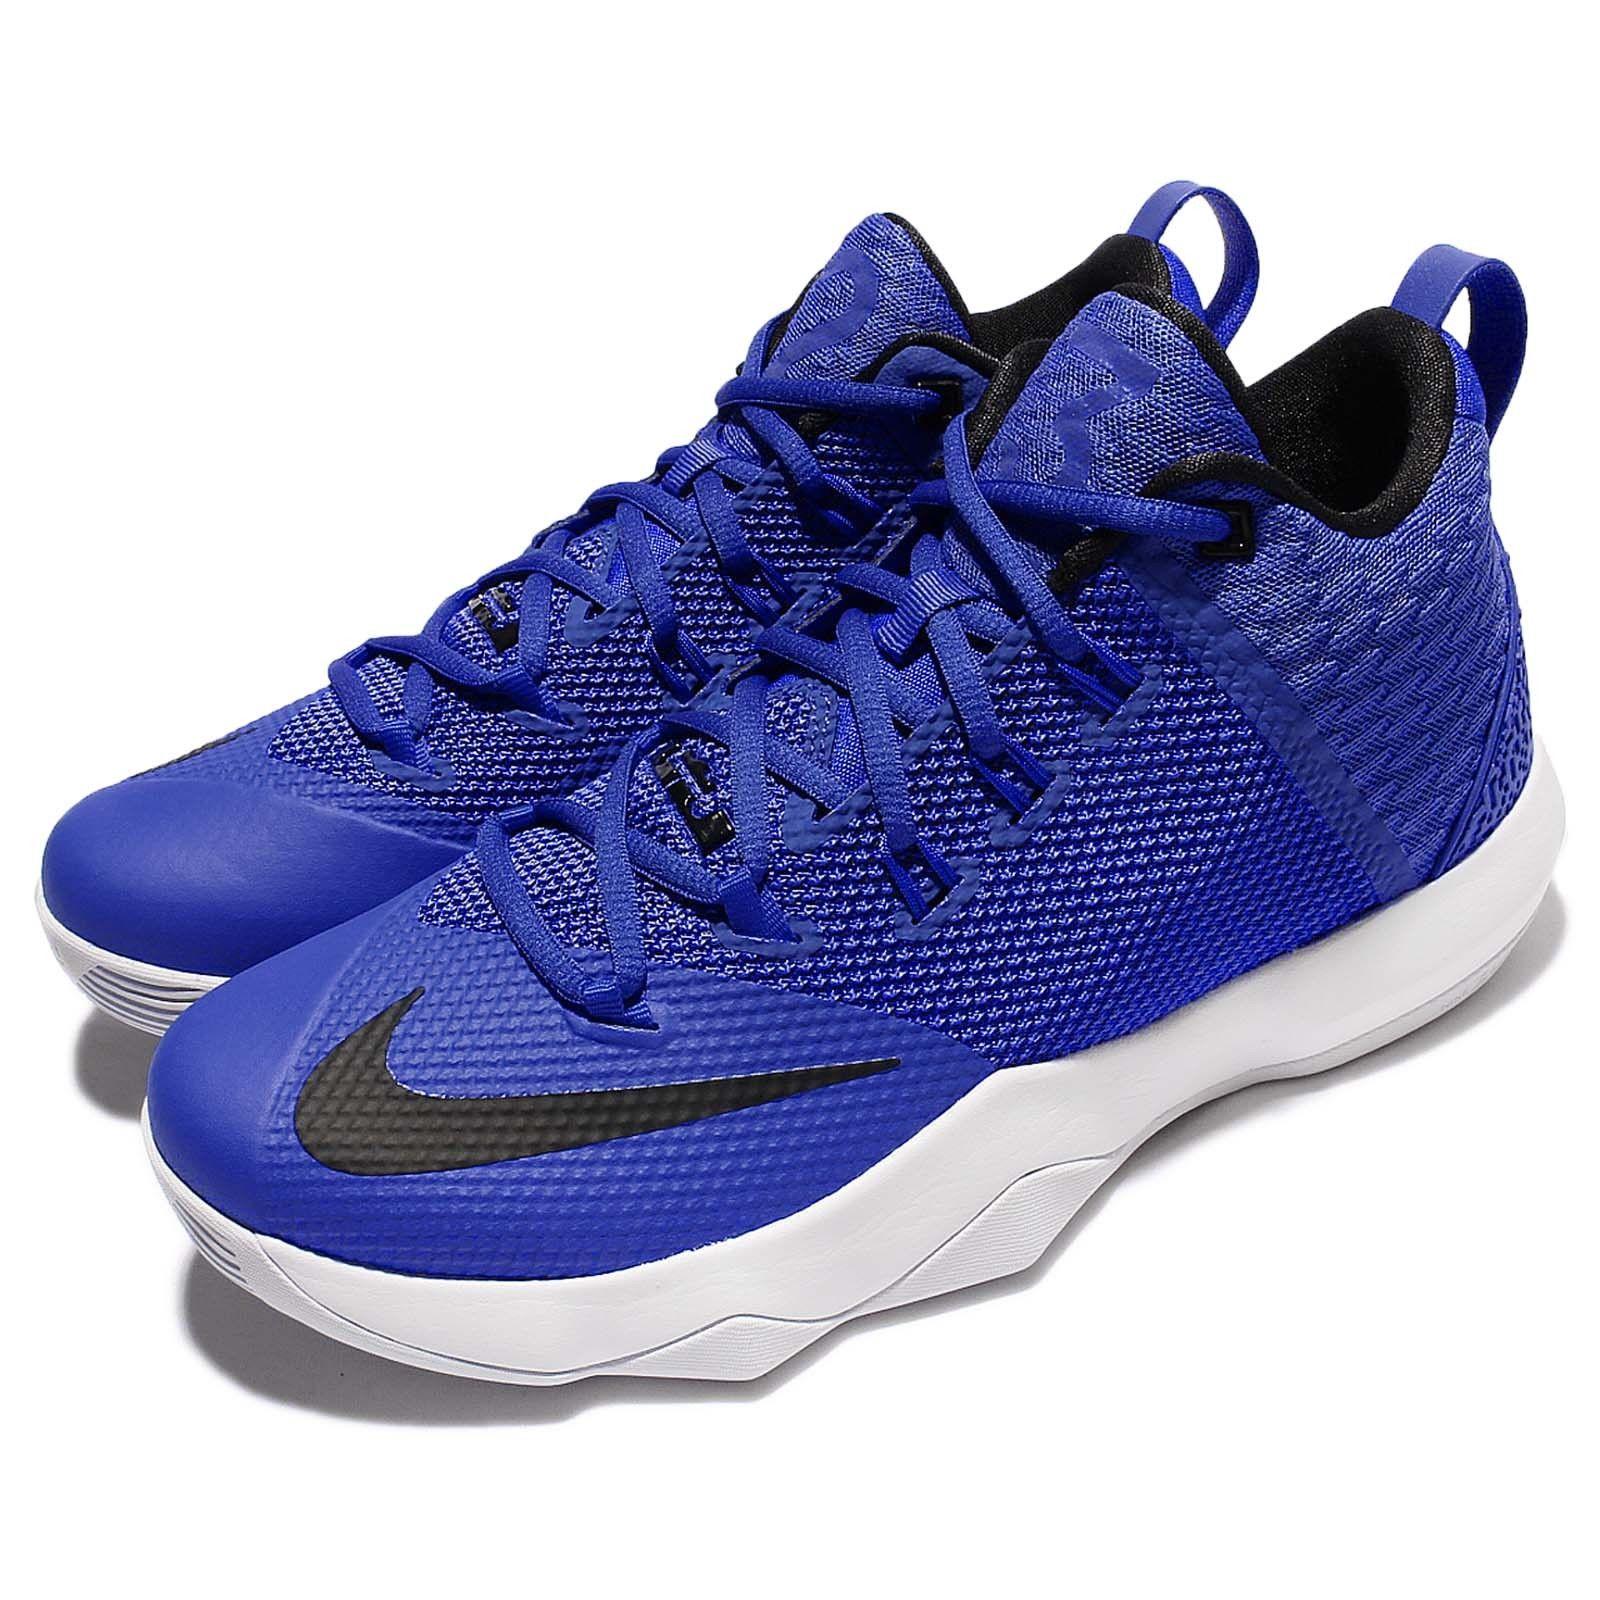 promo code c301c 98a05 Nike Lebron Ambassador 9 – Royal Blue – Full